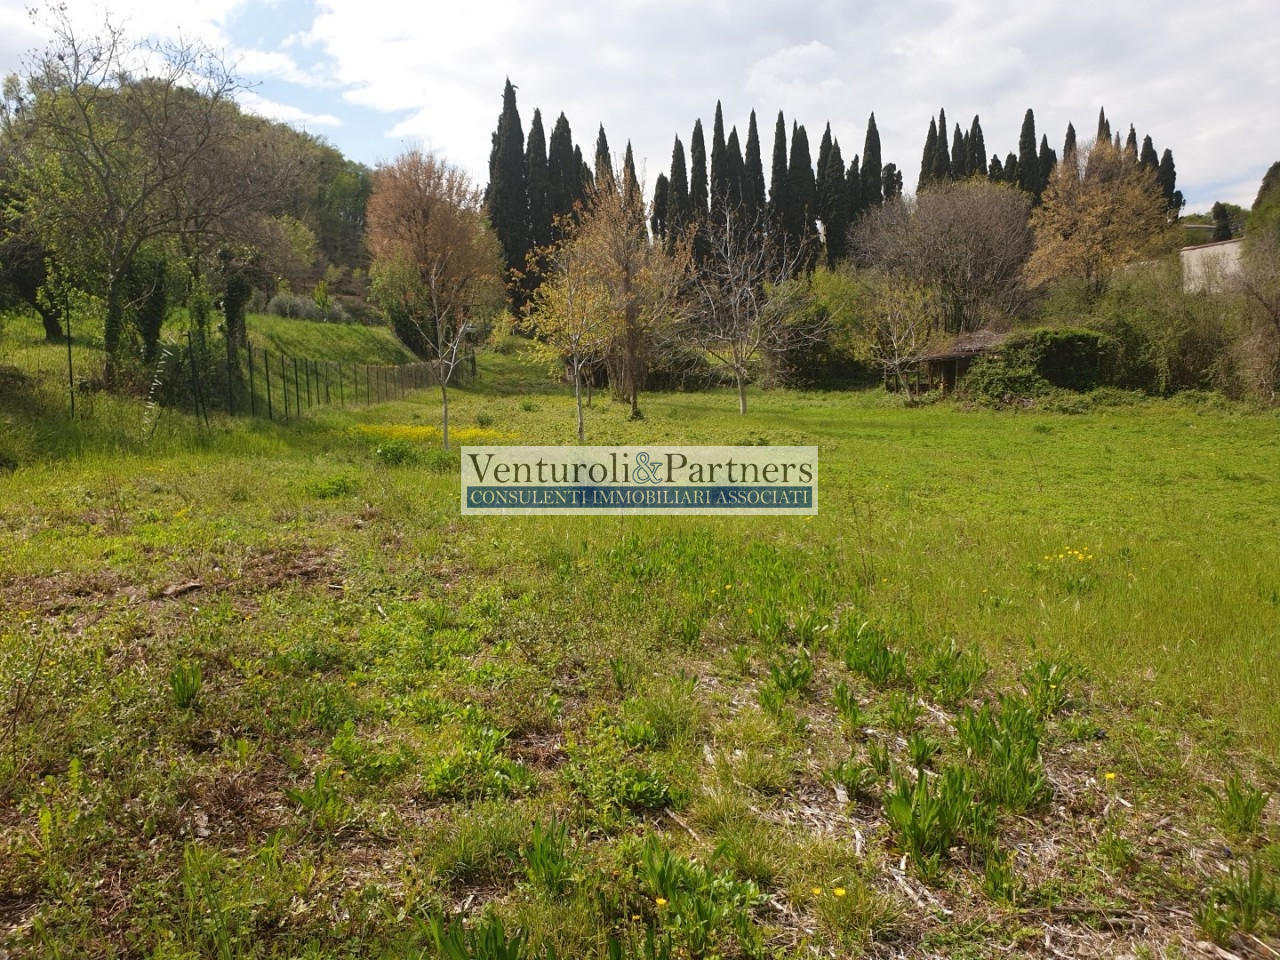 Terreno in vendita a Bedizzole